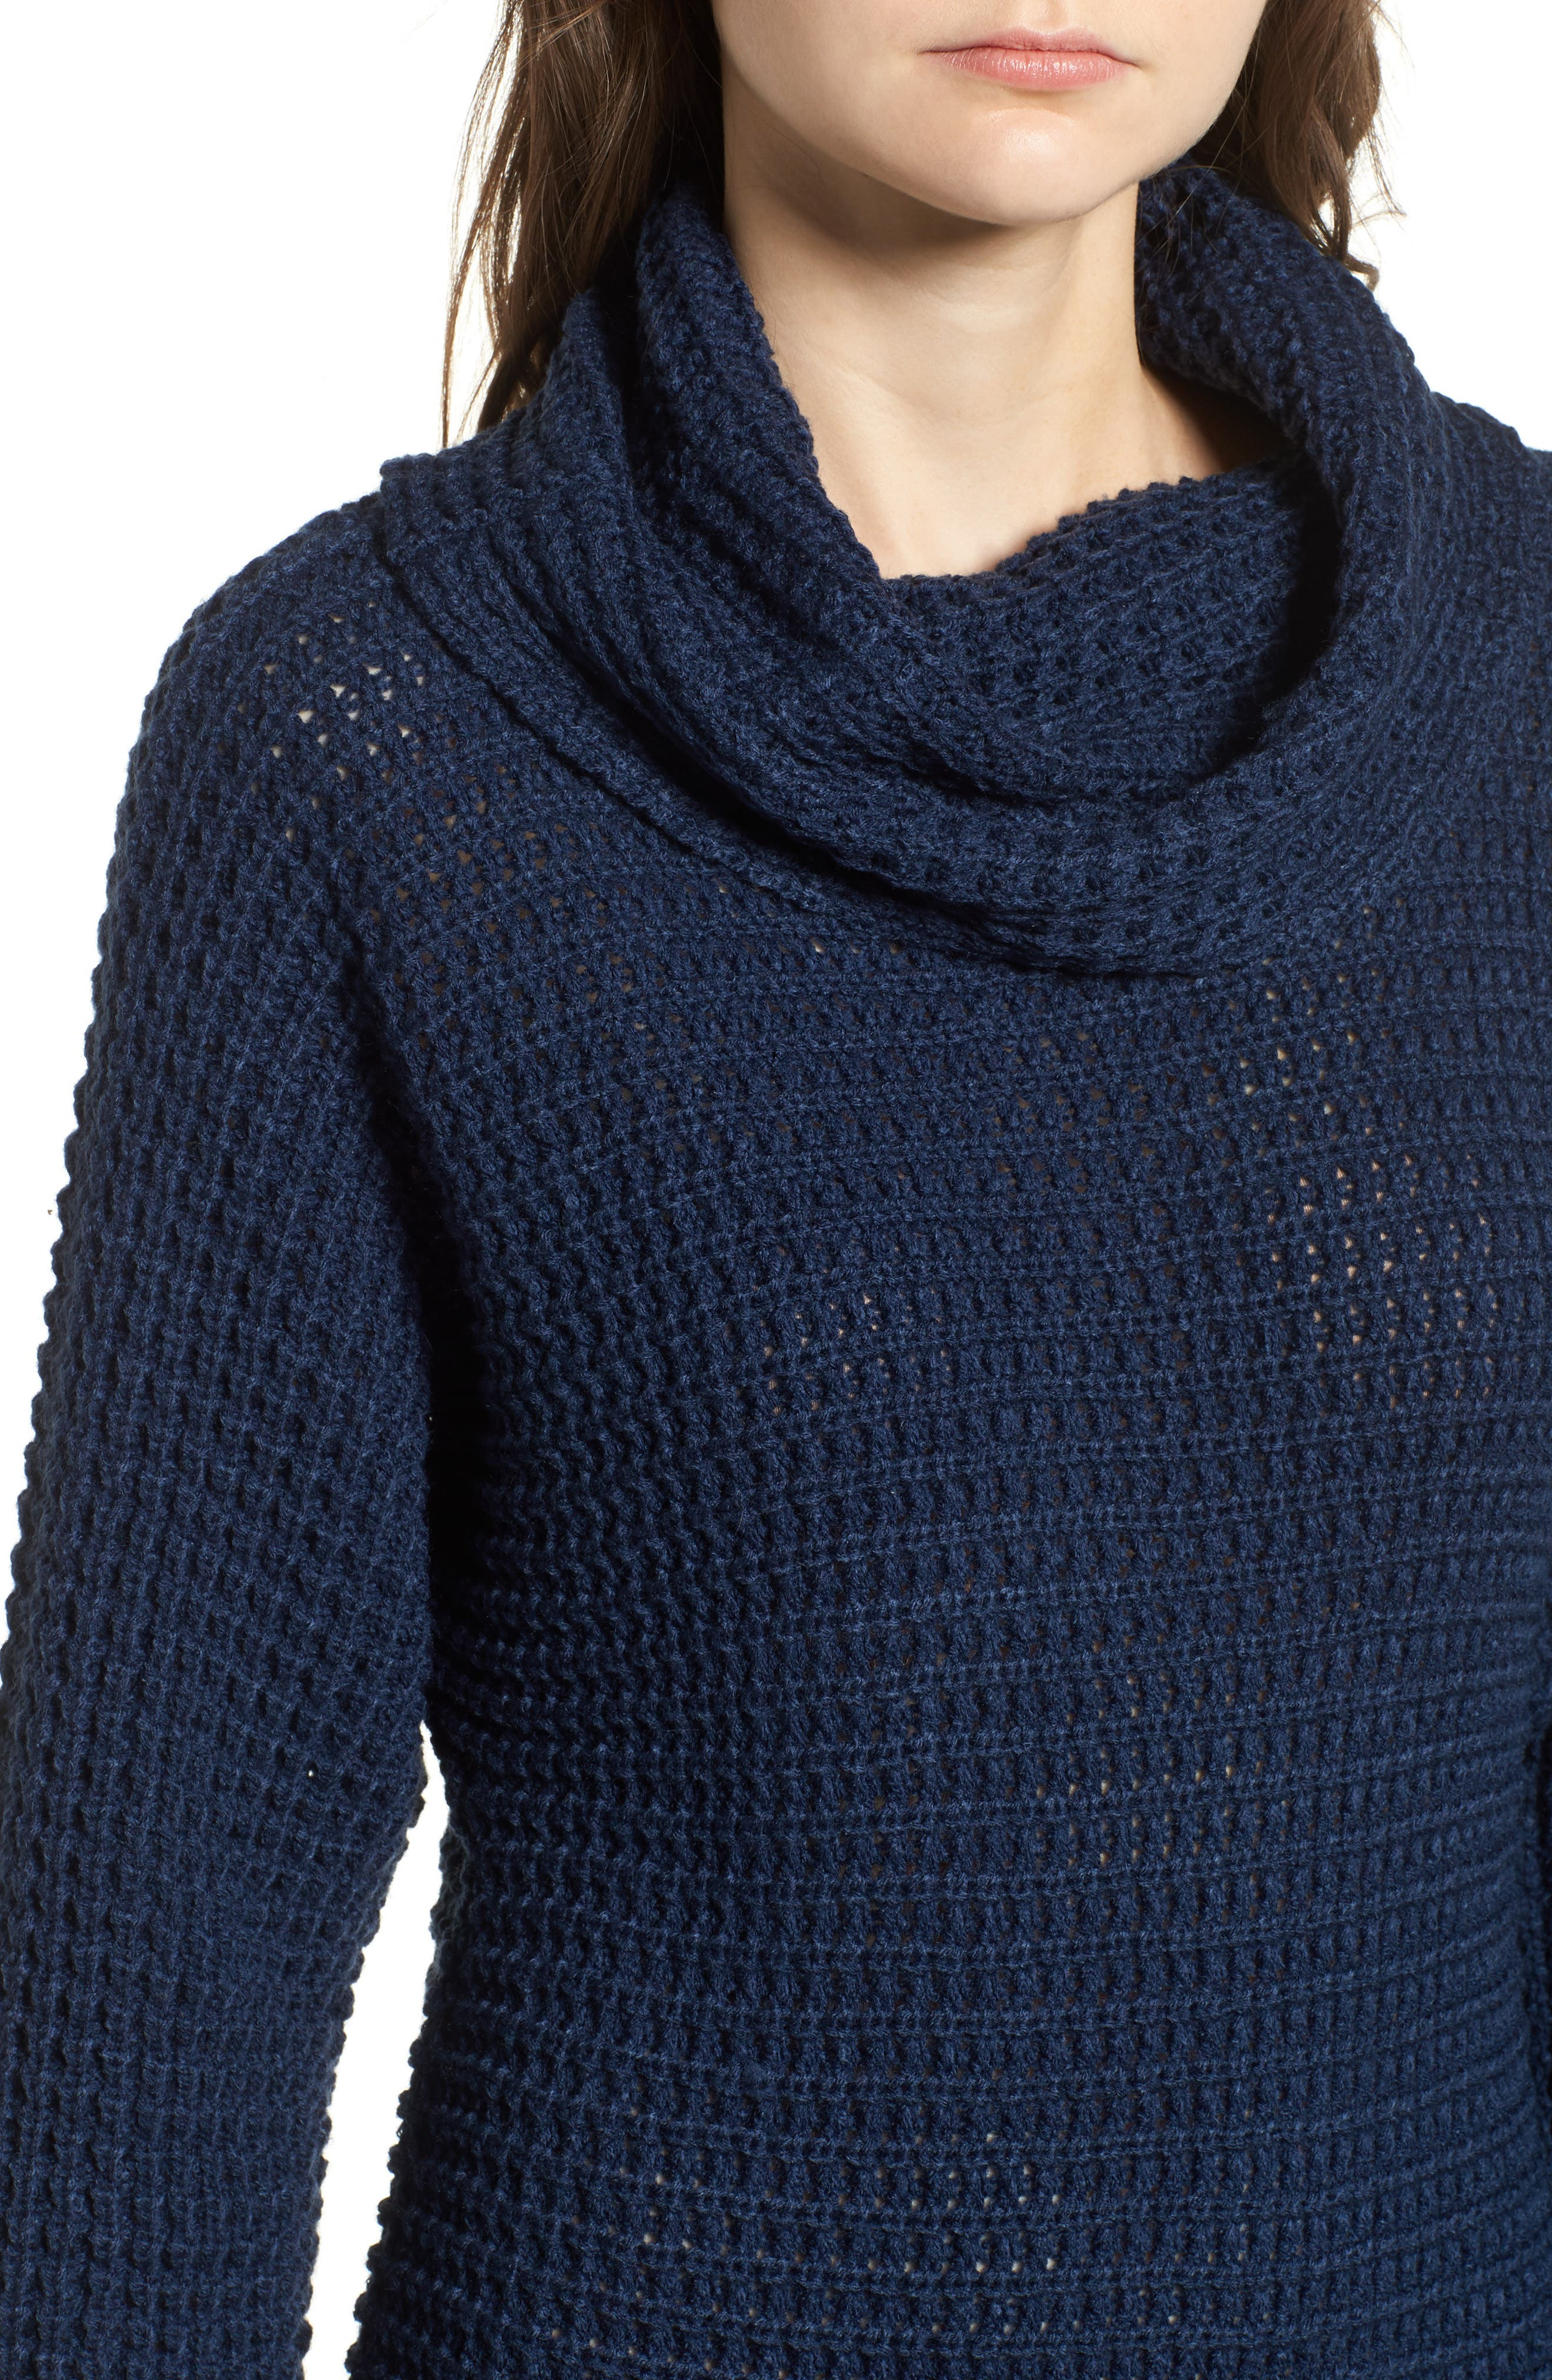 Turtleneck Sweater Dress,                             Alternate thumbnail 4, color,                             Navy